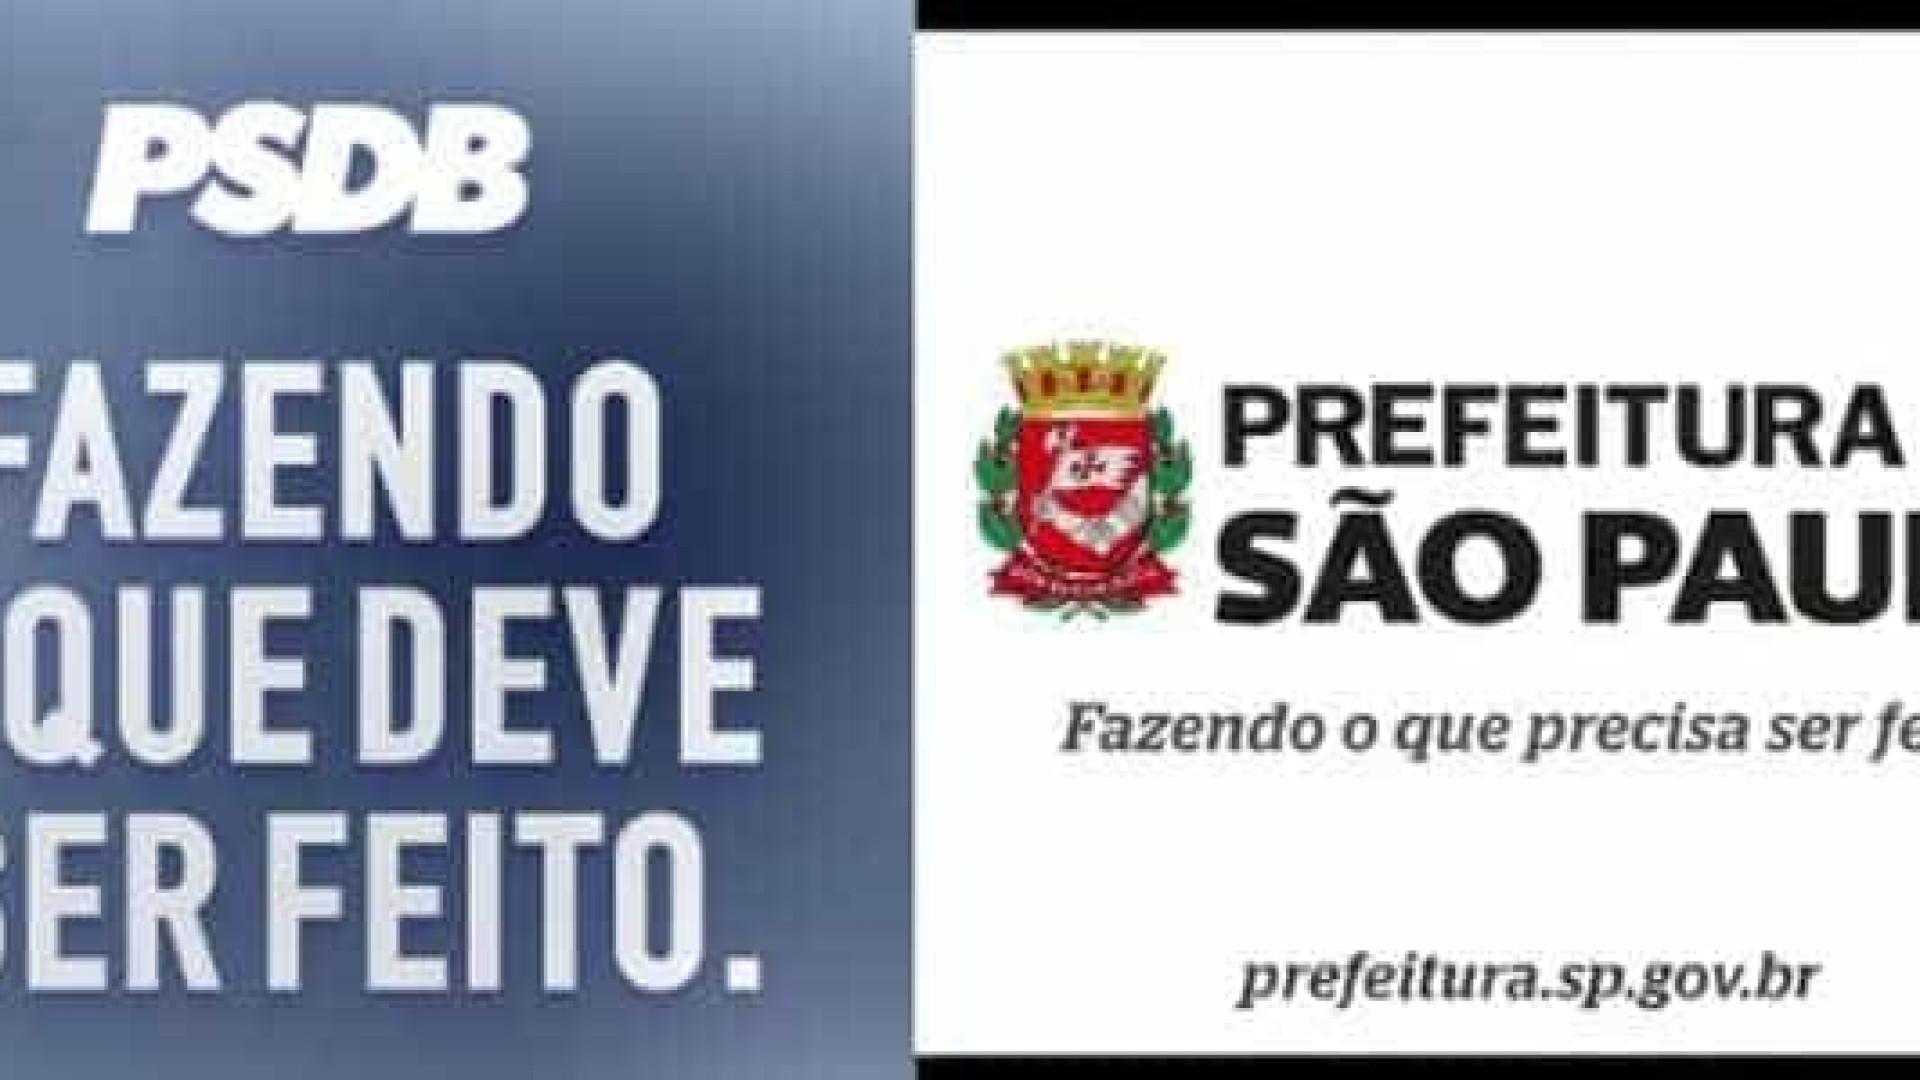 Nova propaganda do PSDB é inspirada em slogan de Haddad